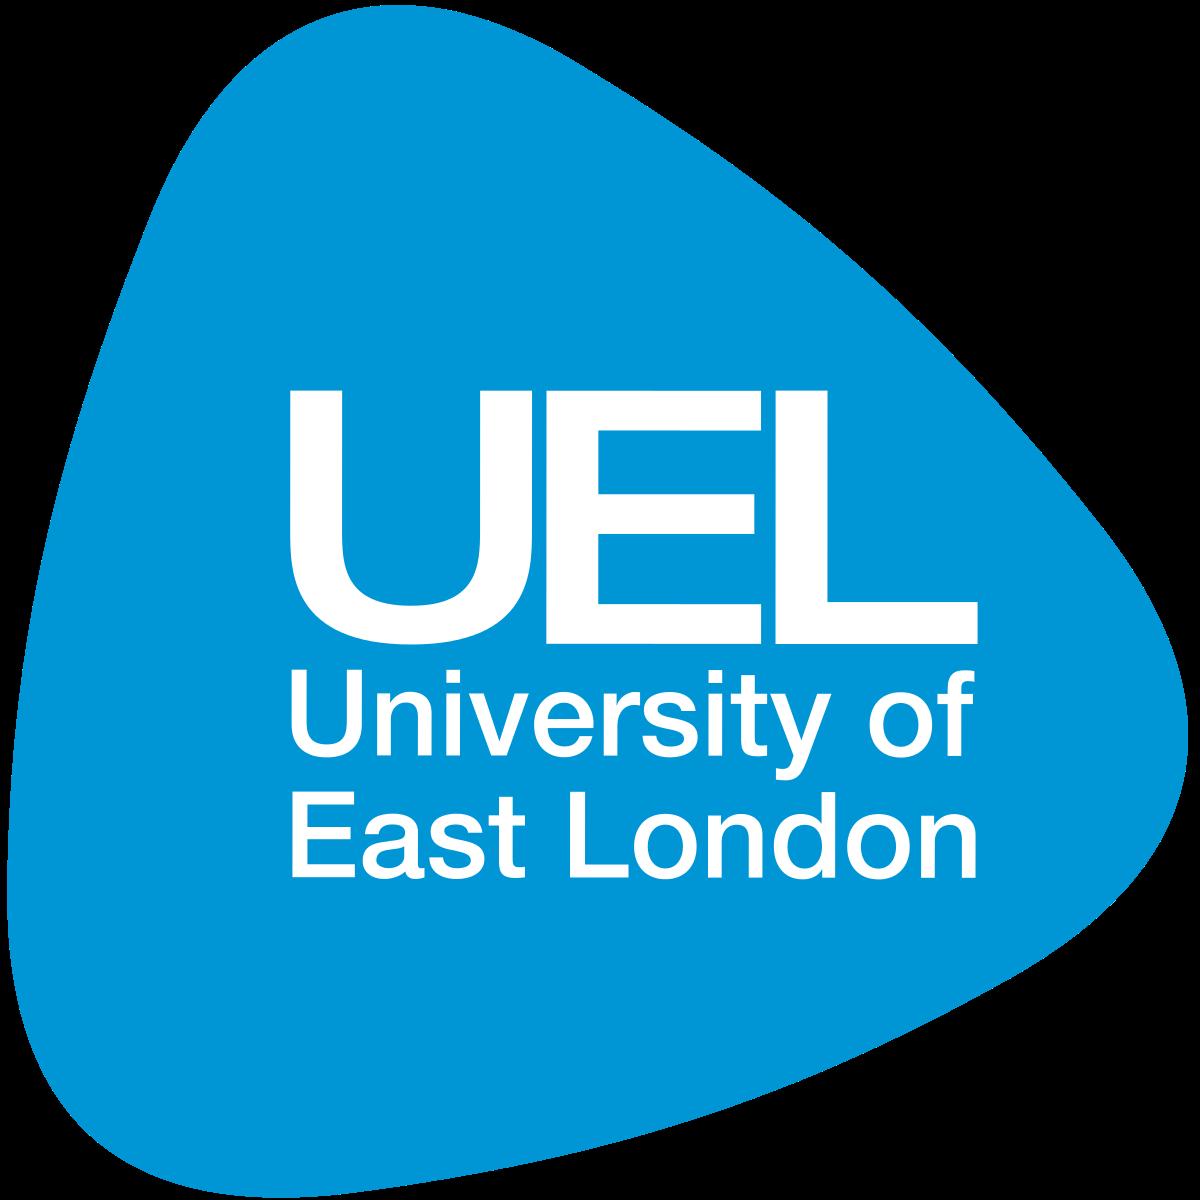 University_of_east_london_logo_2018.png